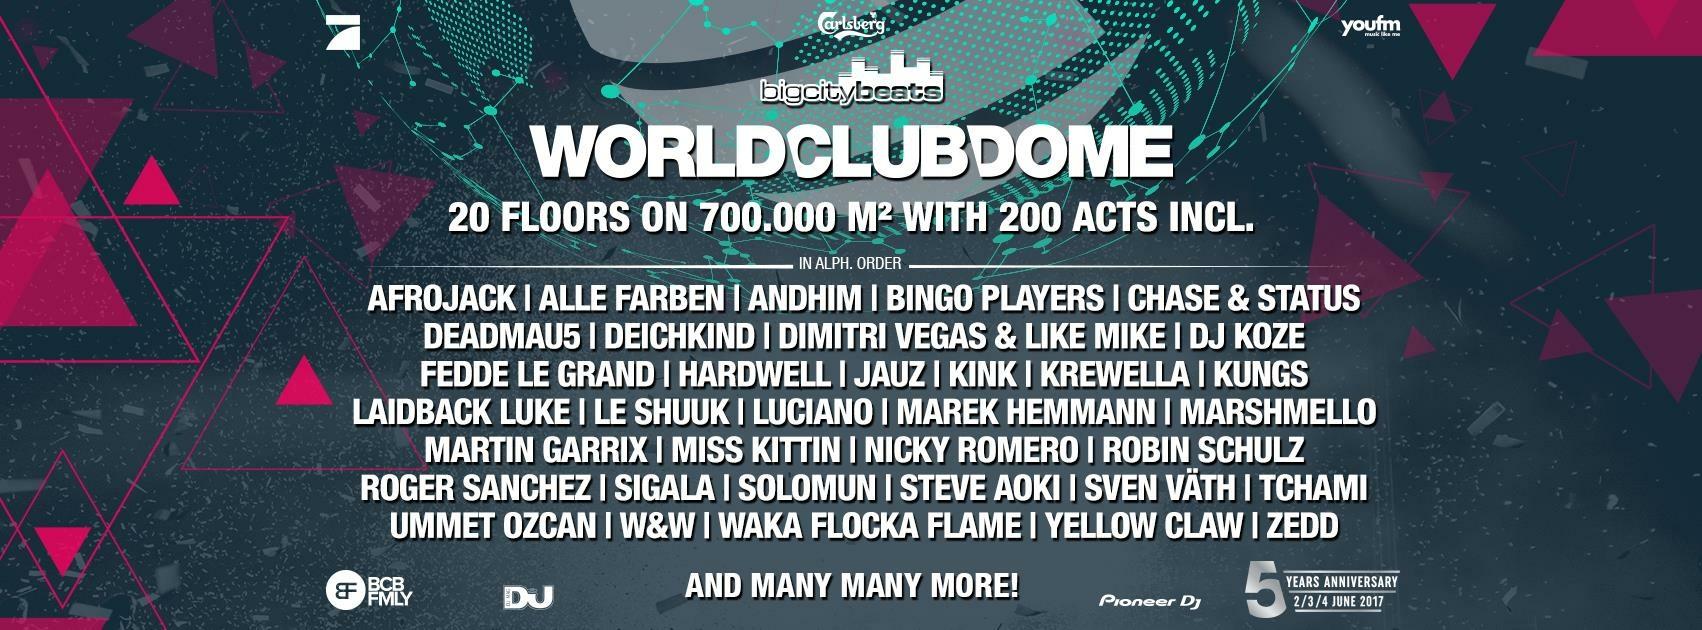 World Club Dome 2 June 2017 Commerzbank Arena Frankfurt Am Main